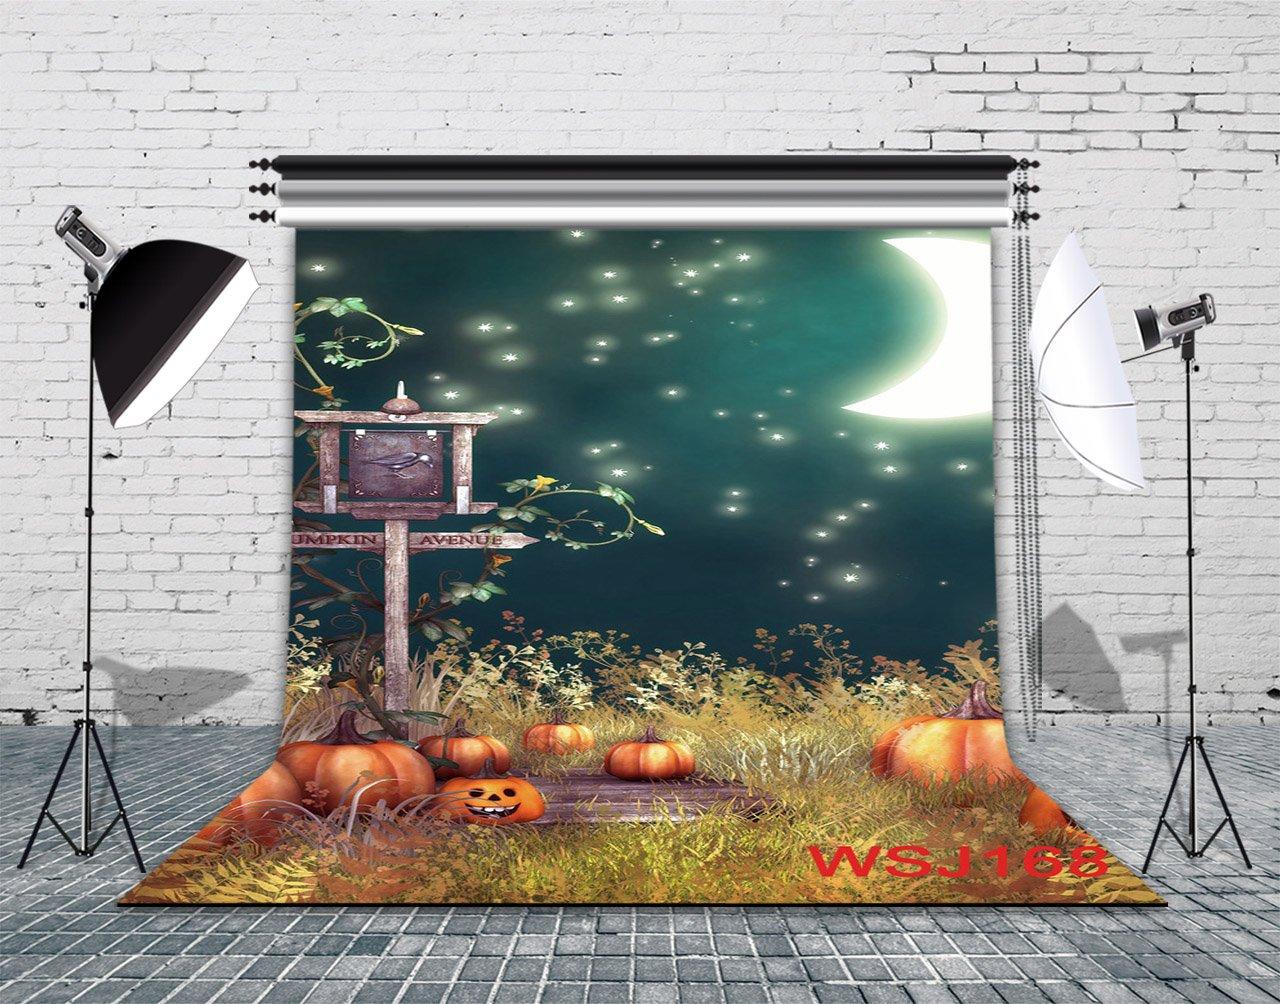 LB 8x8ft Halloween Photography Backdrop Vinyl Customized Halloween Decor Photo Background Studio Prop WSJ168